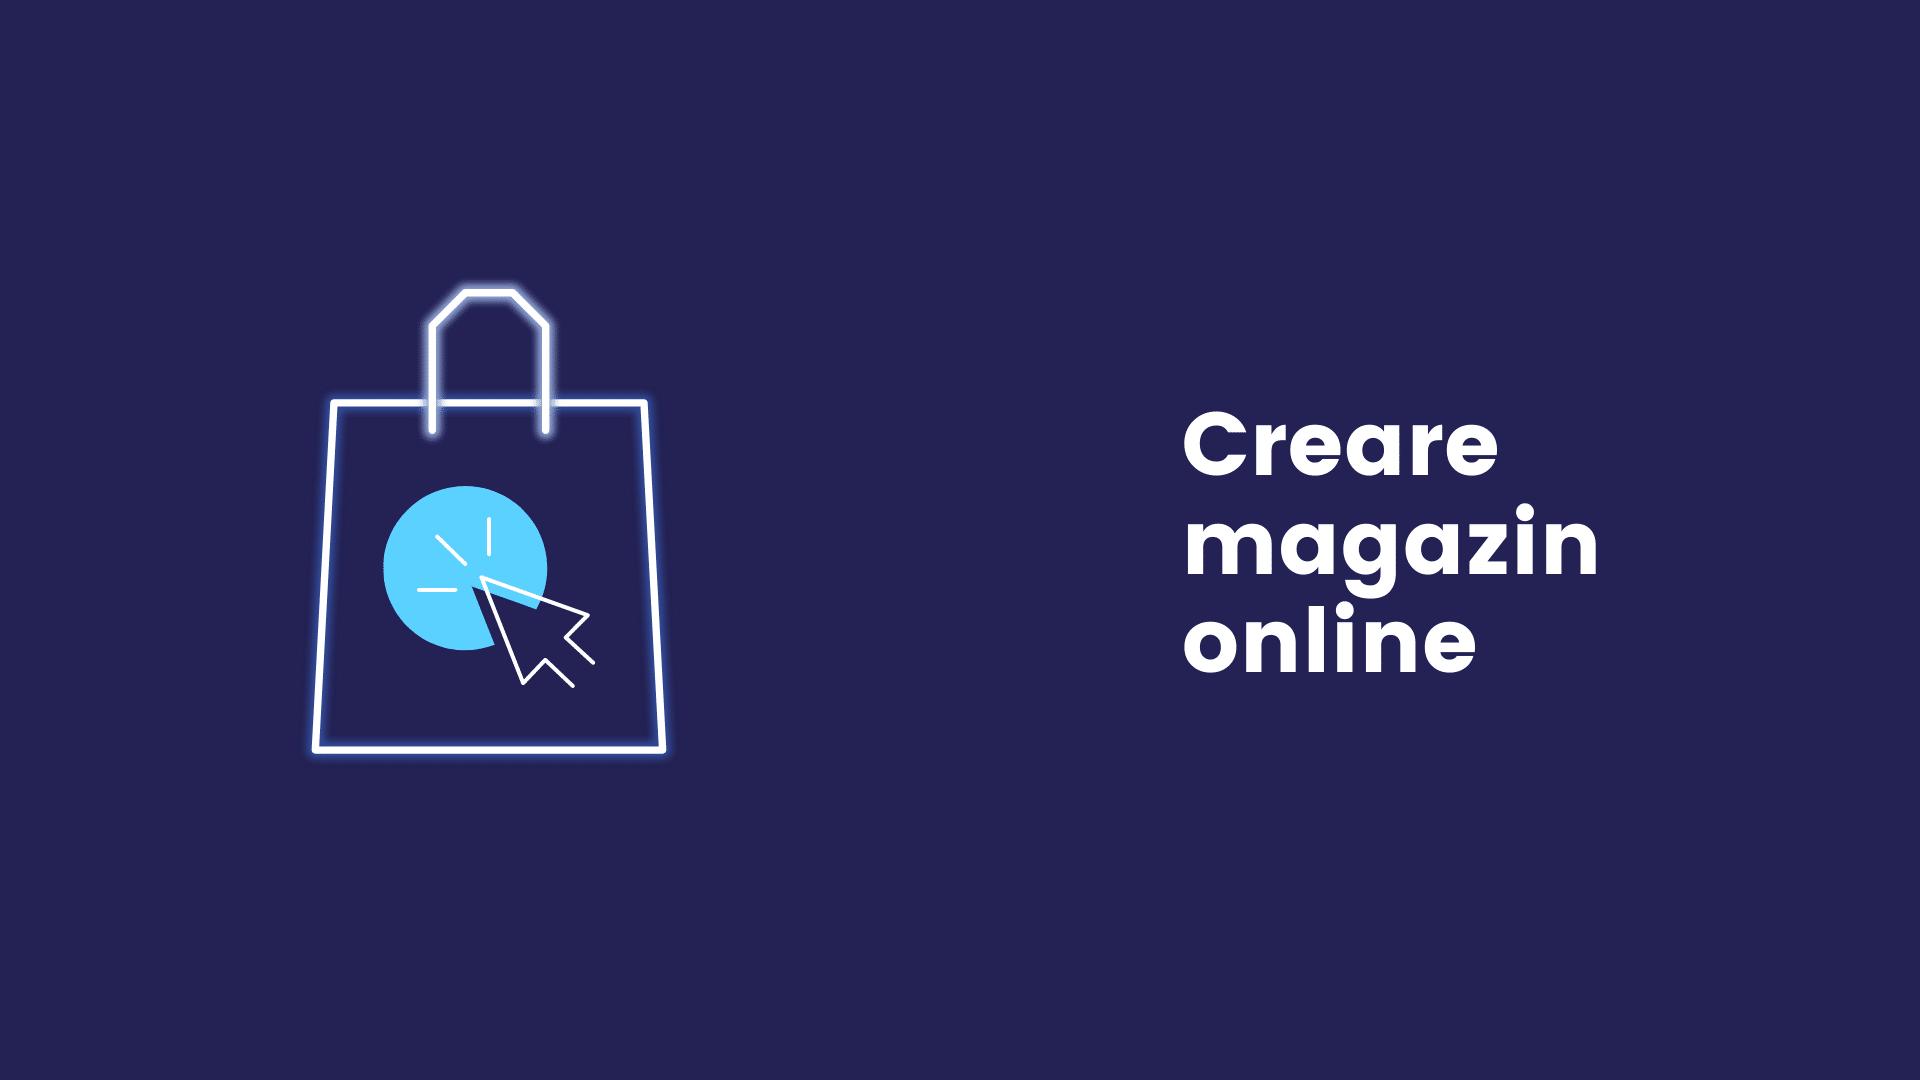 Creare magazin online, site de ecommerce cluj, platforme magazine online. Realizare magazin online profesional cu plata PayPal, MobilPay, posibilitatea comenzilor online, vanzari produse online. Platforma ecommerce pentru conversii.